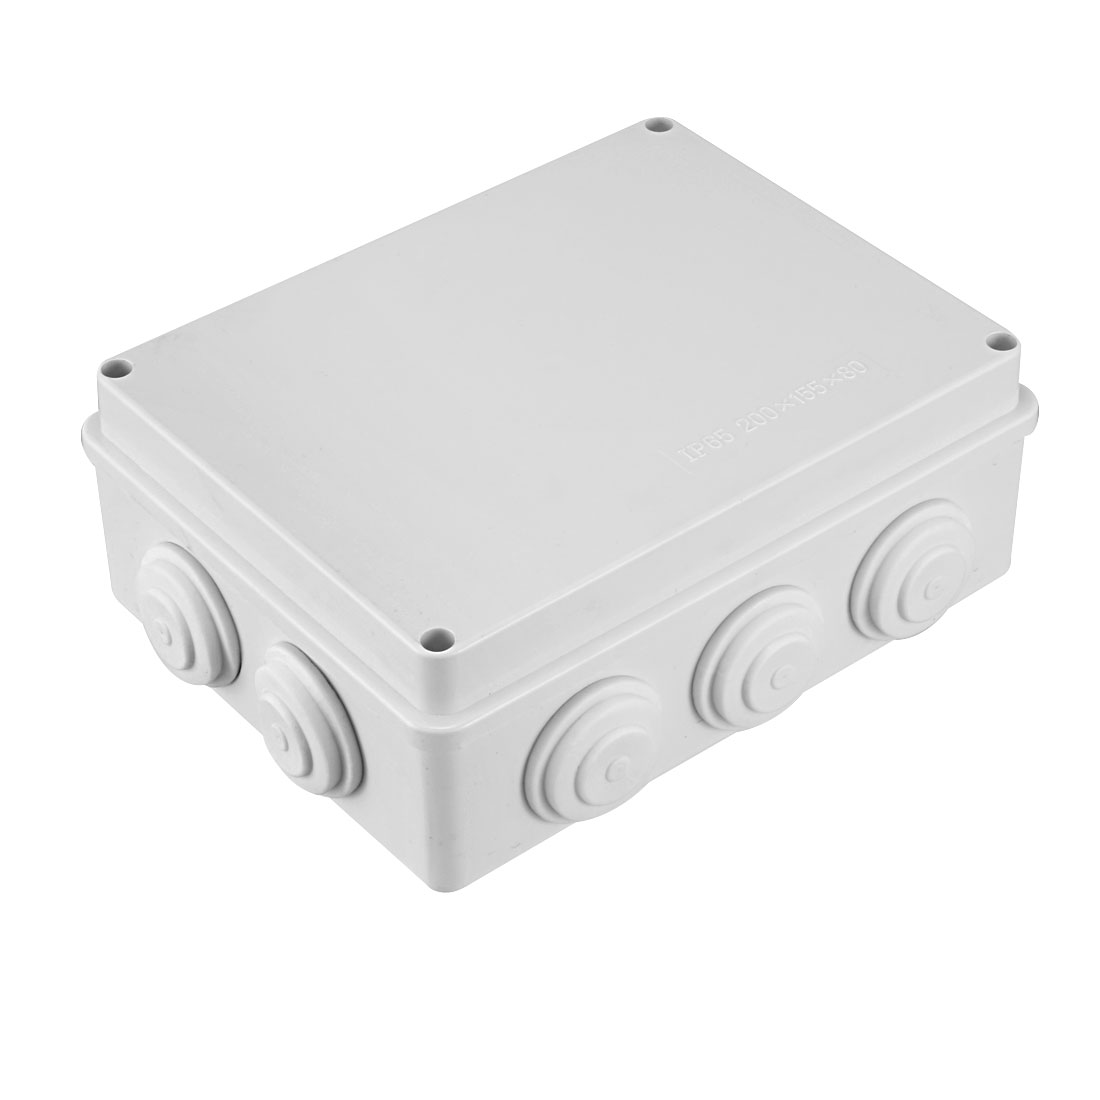 200 x 155 x80mm Electronic Plastic DIY Junction Box Enclosure Case White